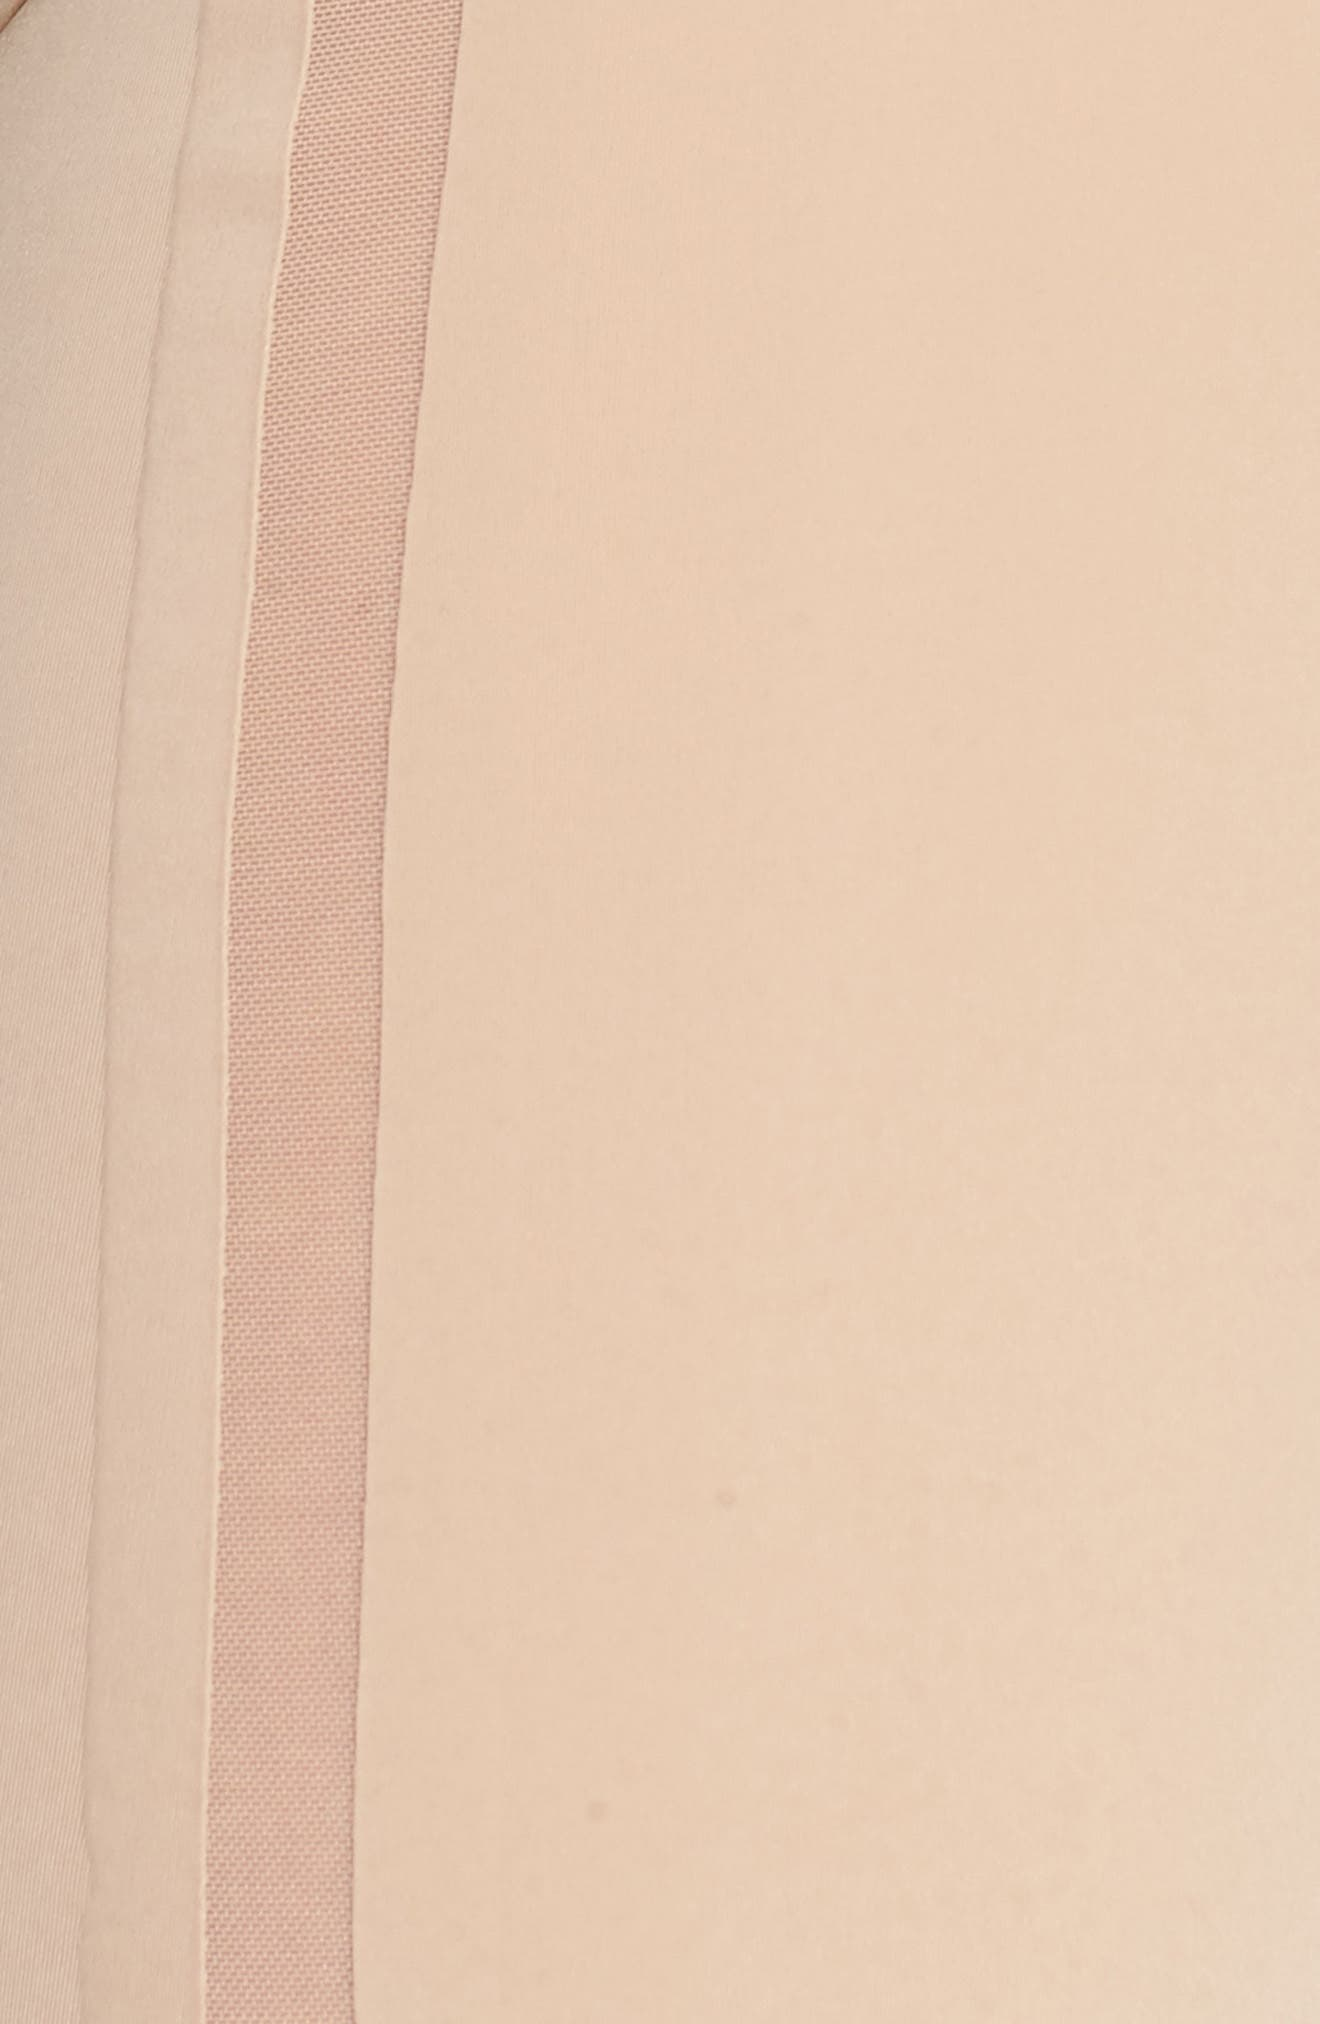 Sculpted Shapewear Thigh Shaper,                             Alternate thumbnail 6, color,                             Bare